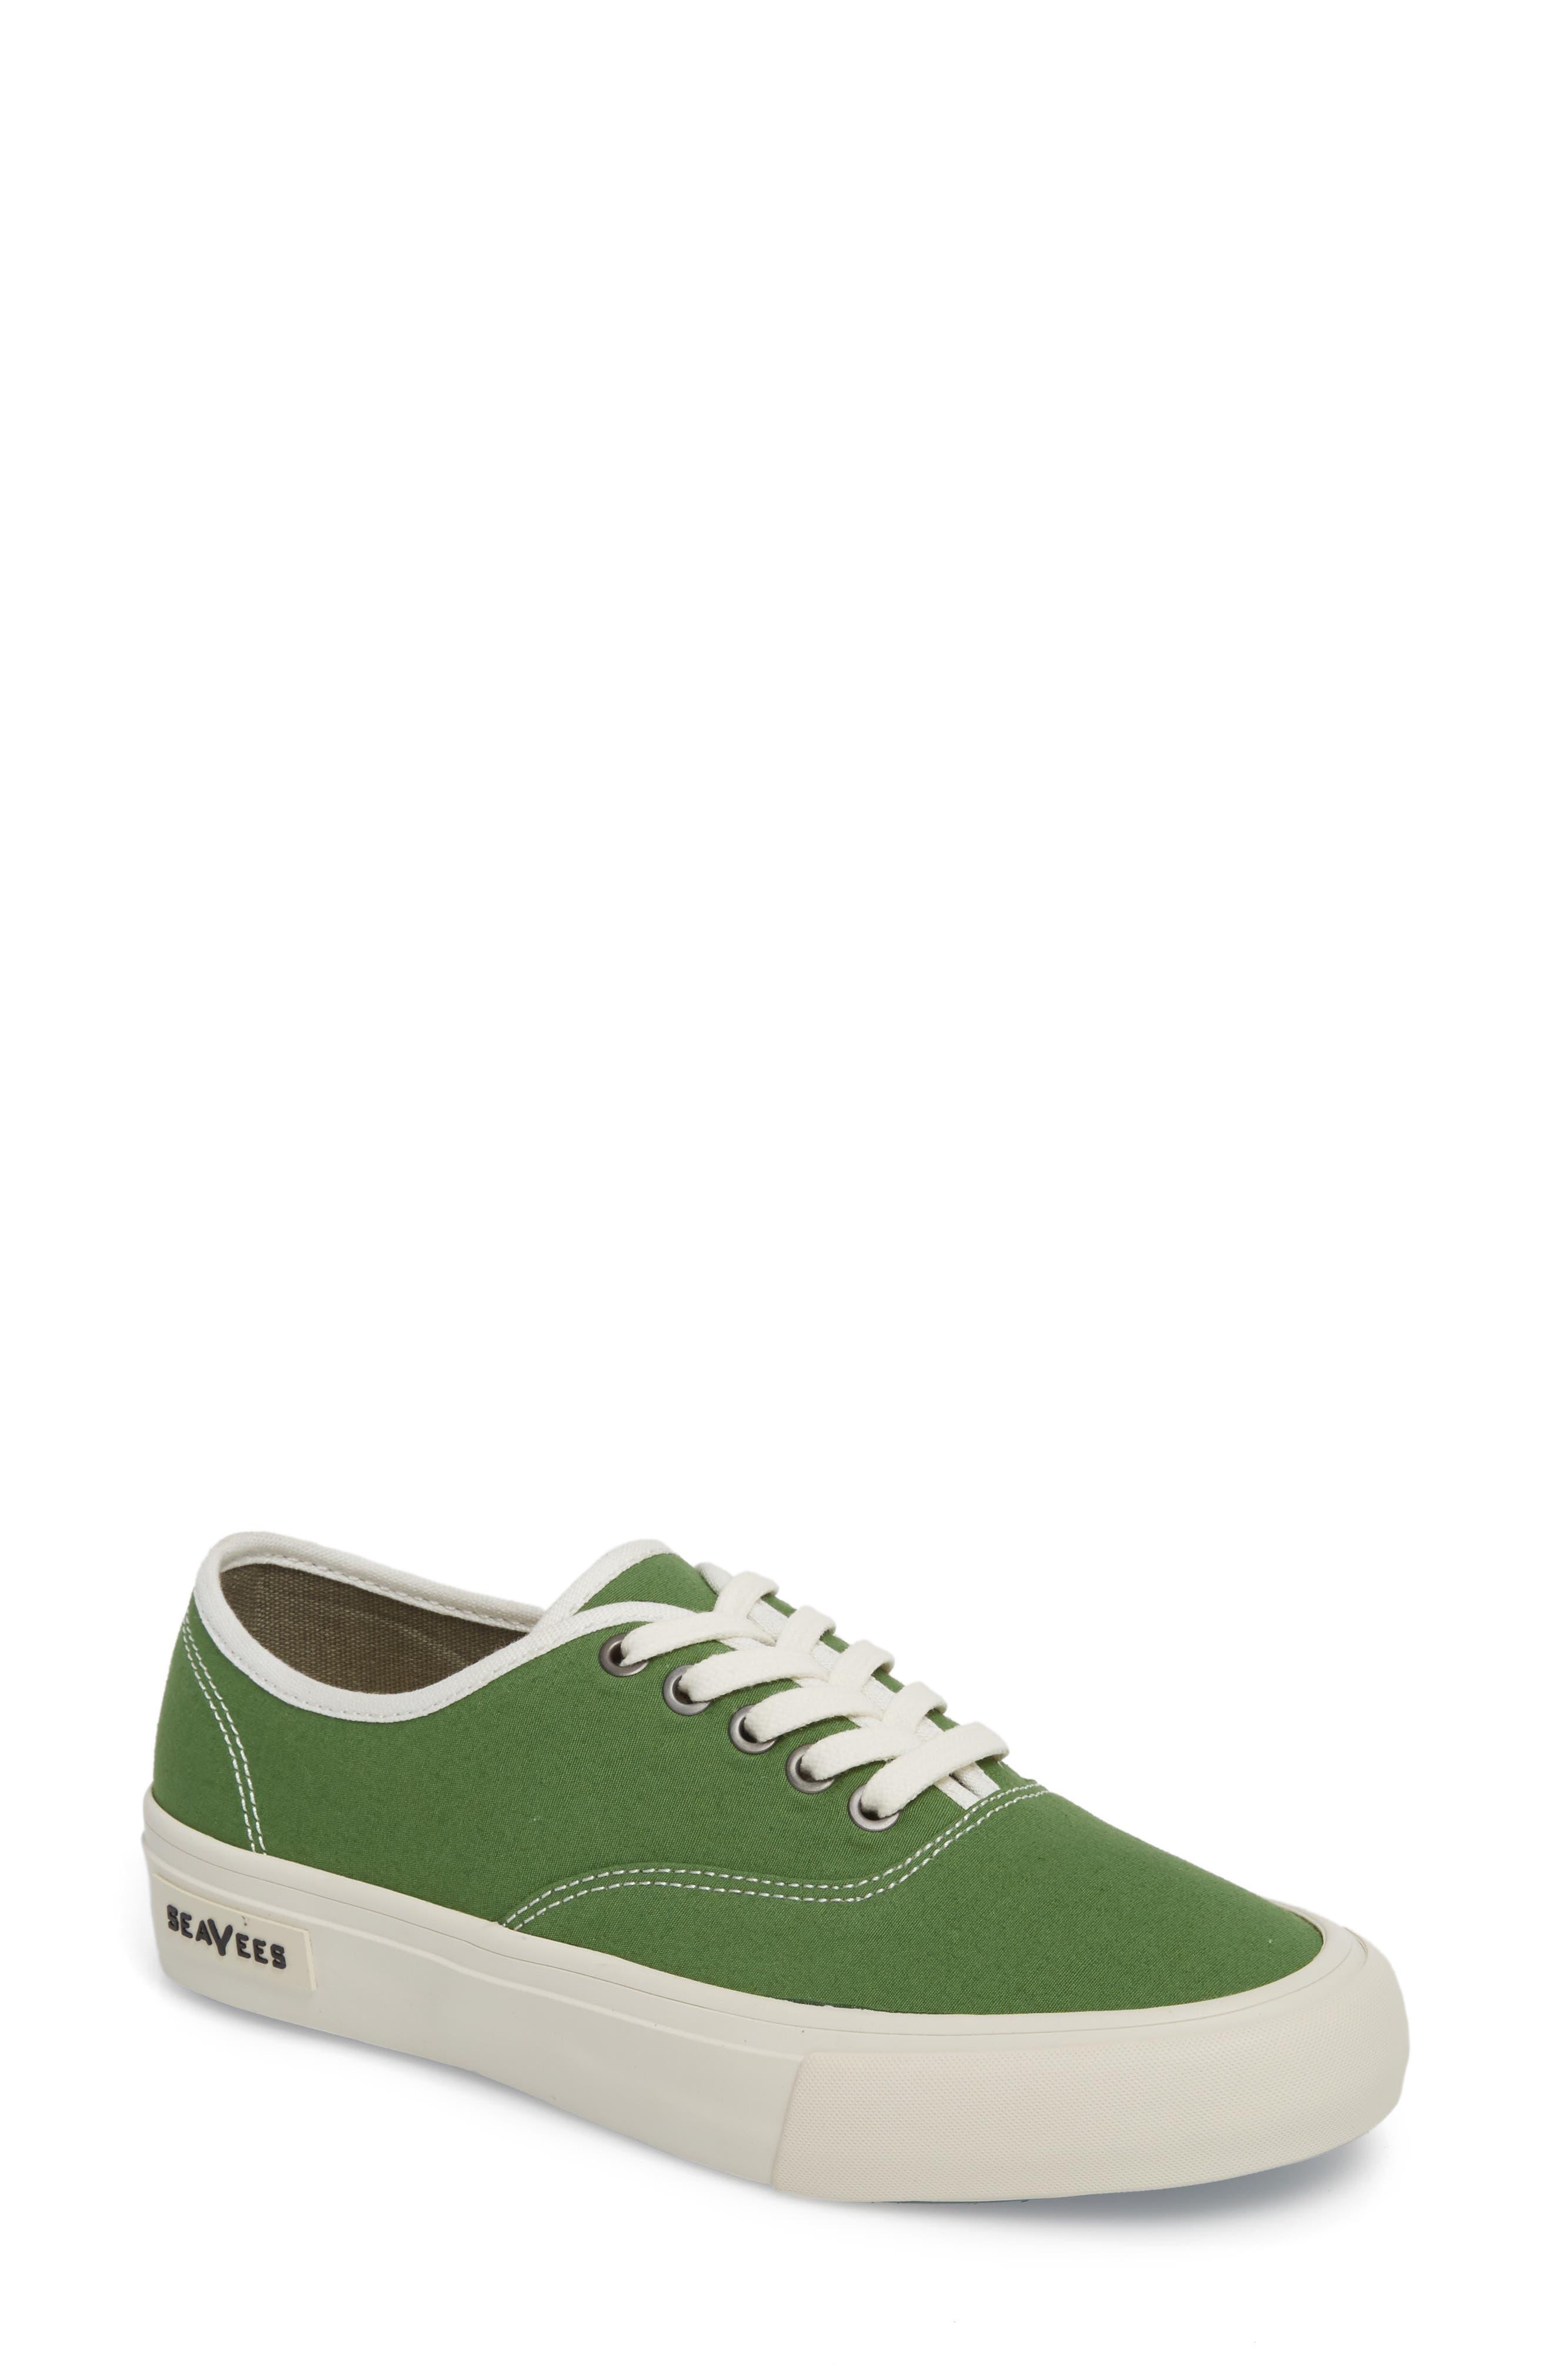 SEAVEES,                             Legend Standard Sneaker,                             Main thumbnail 1, color,                             CACTUS